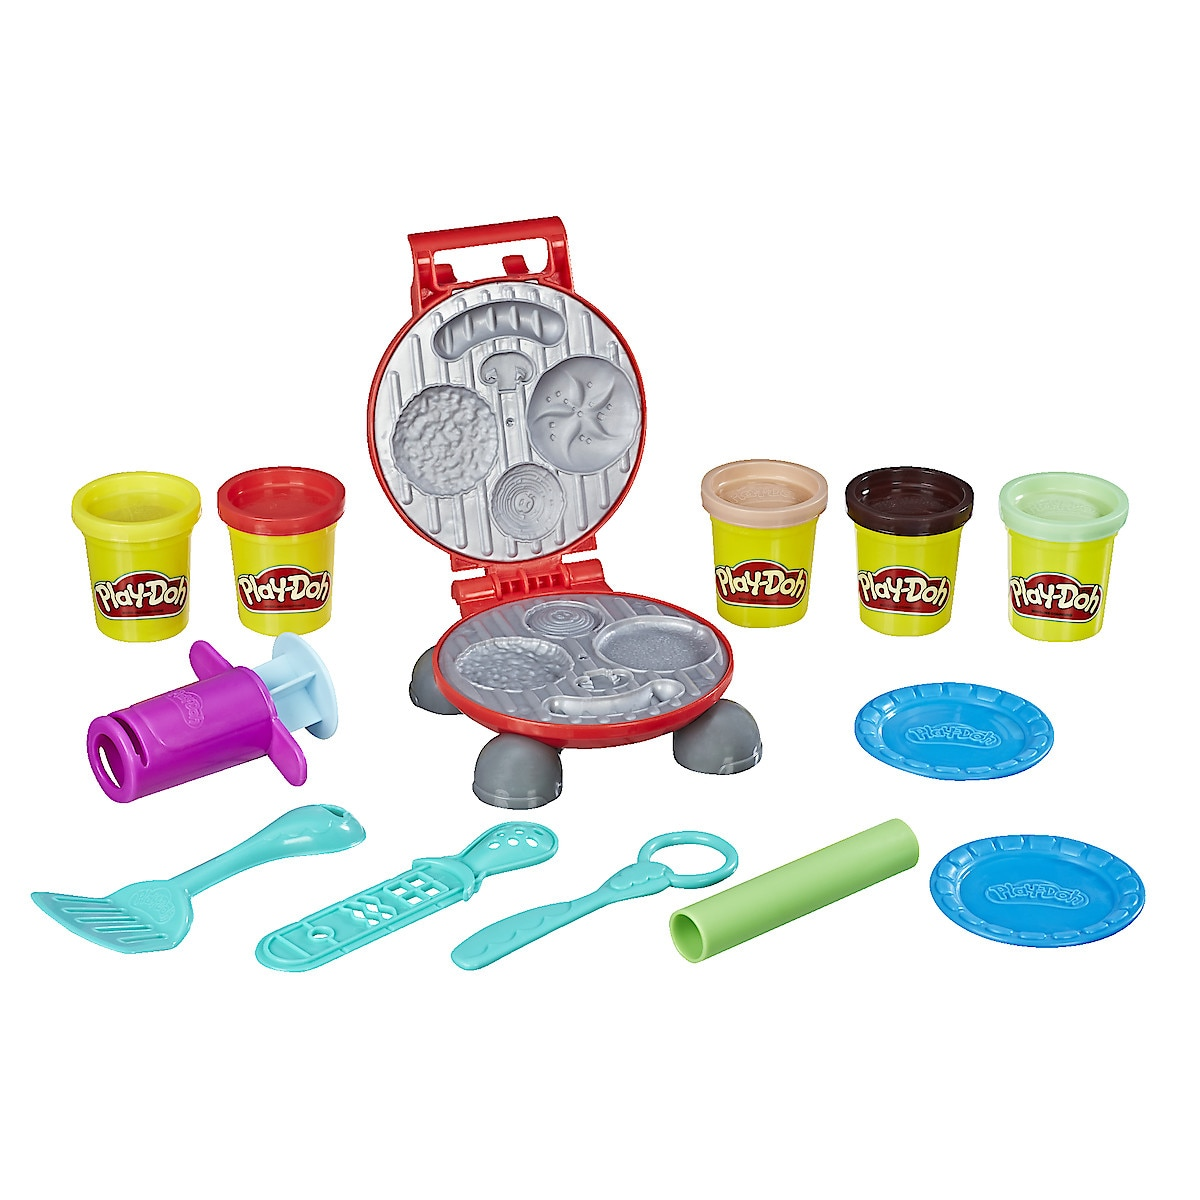 Leklera Play-Doh Burger Barbecue Set